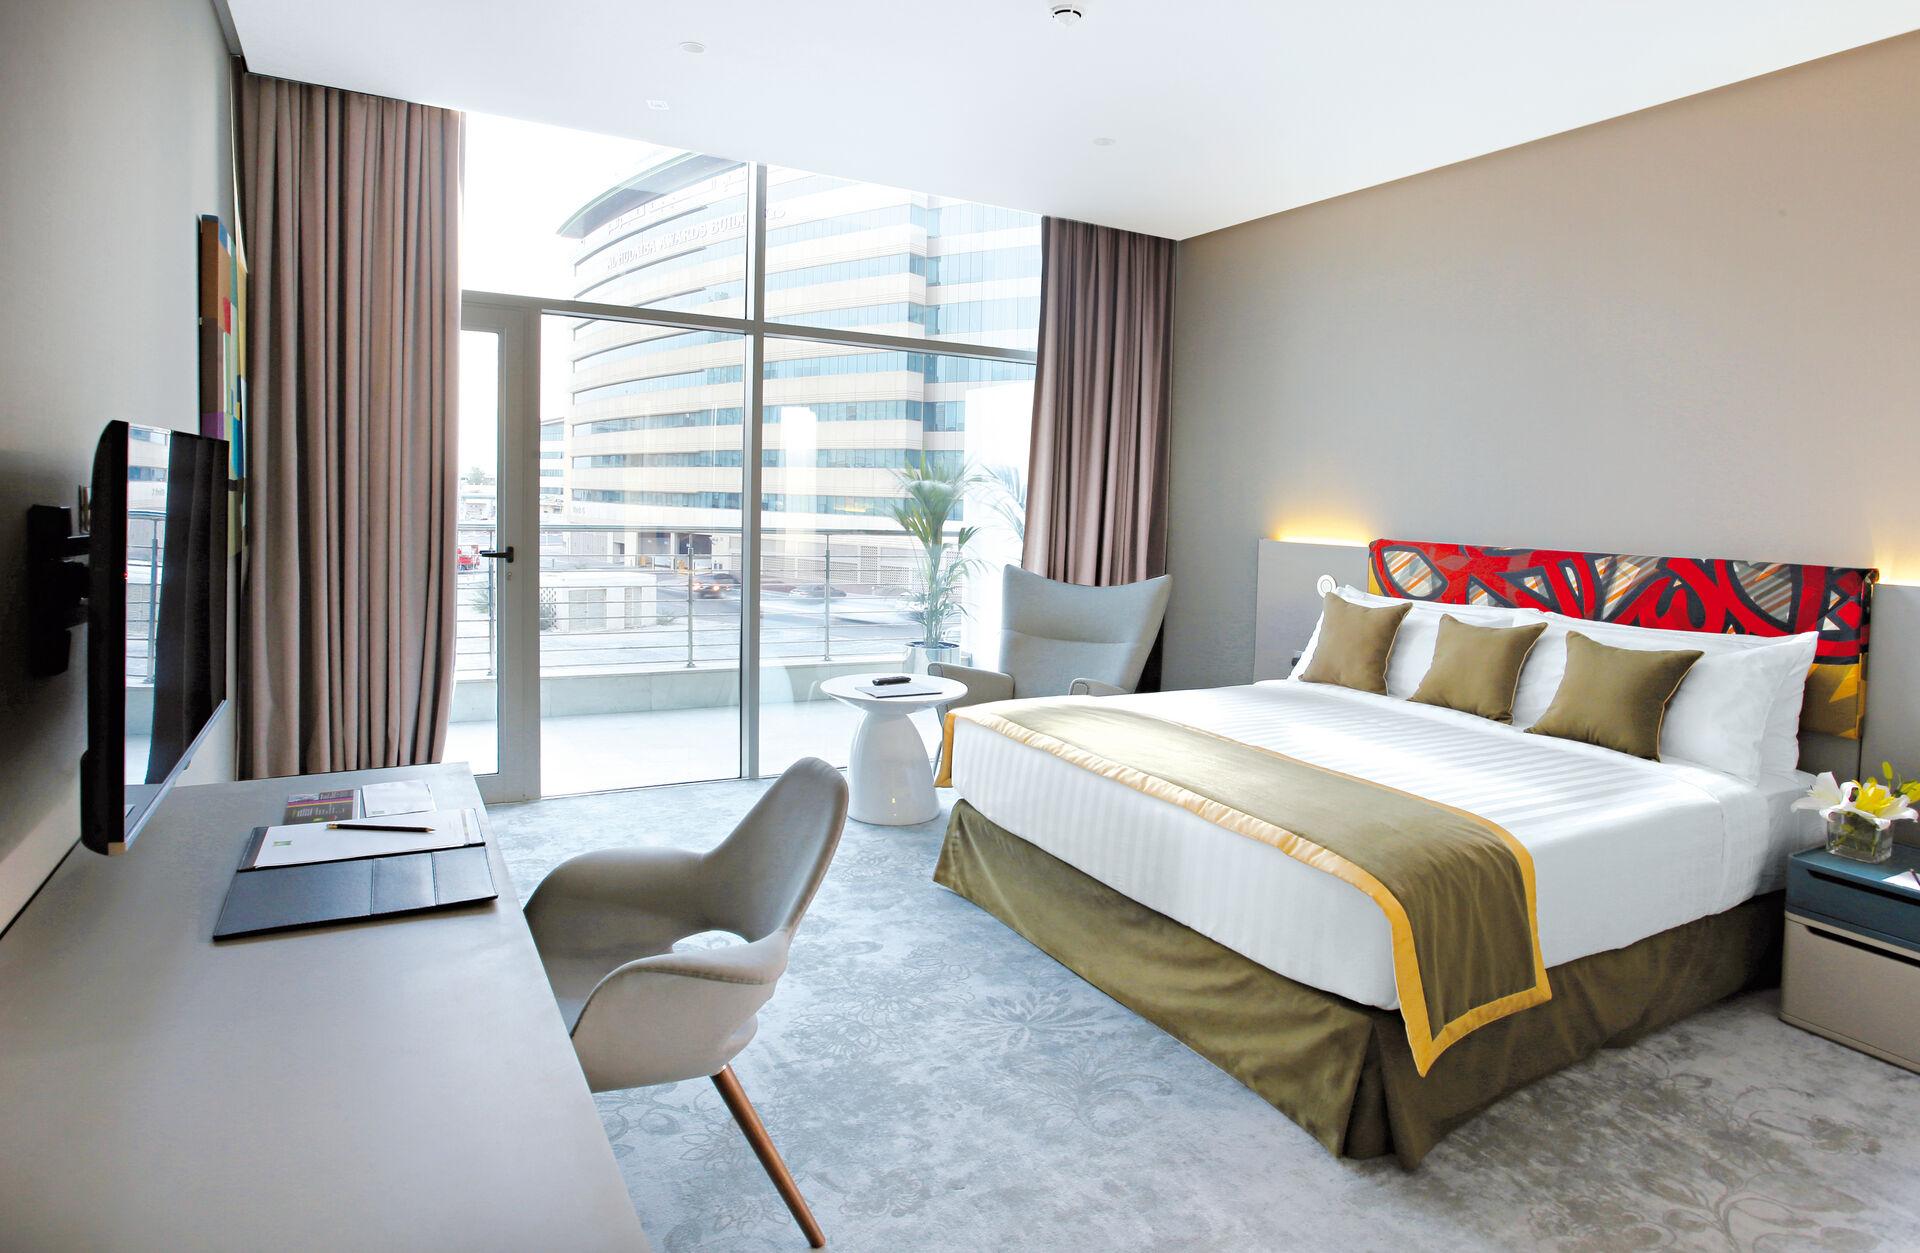 Ibis Styles Hotel Jumeira Dubai - 3*